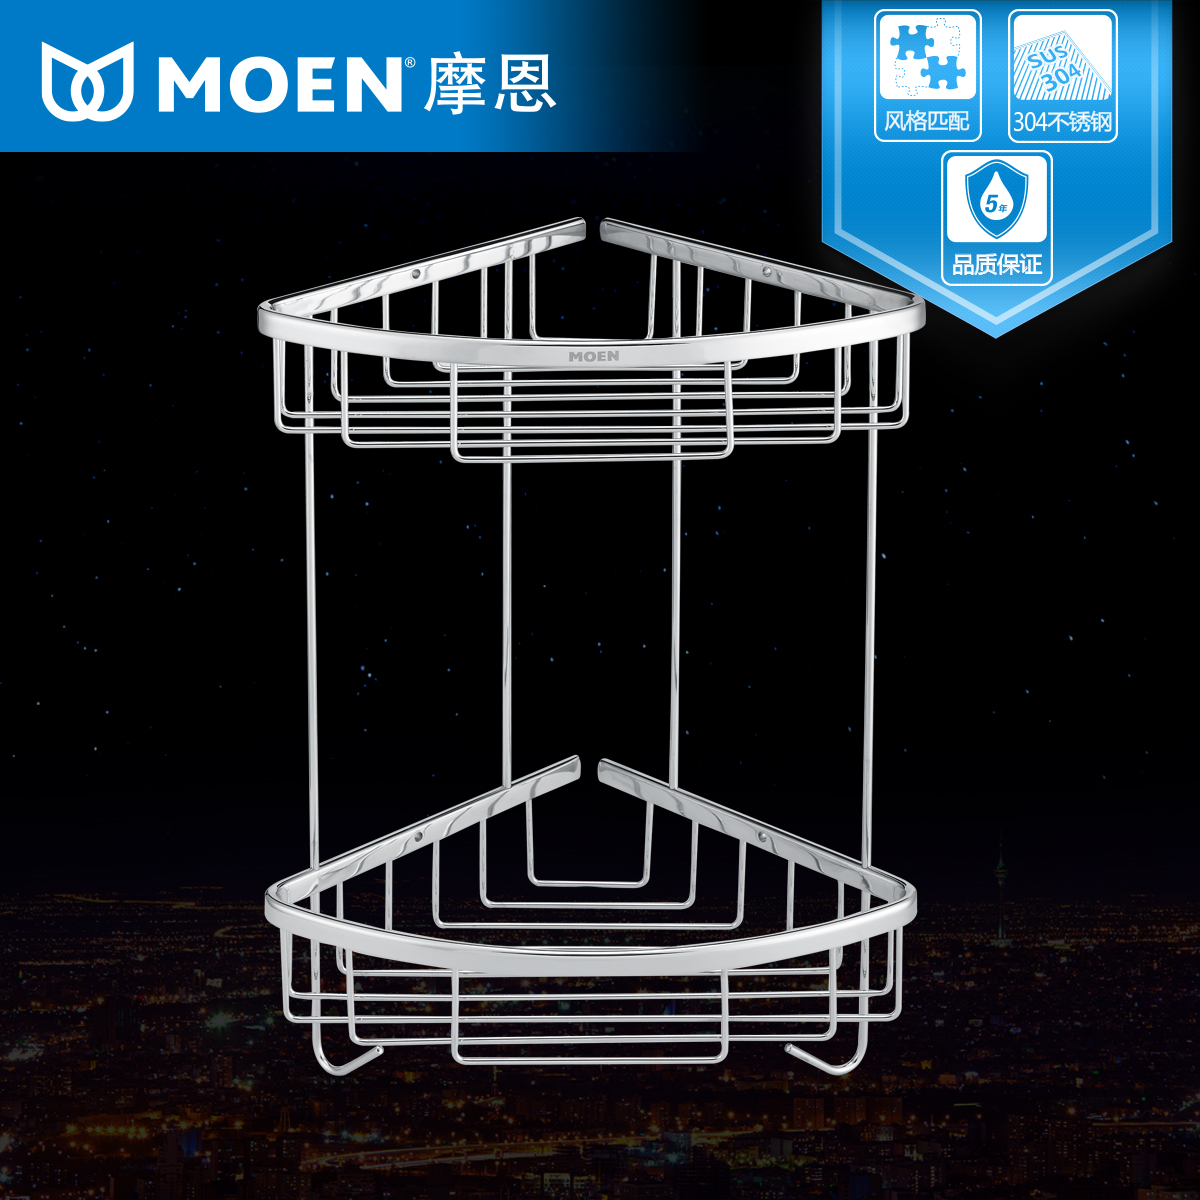 MOEN摩恩三角置物架浴室收納籃衛浴掛件 雙層角籃90102